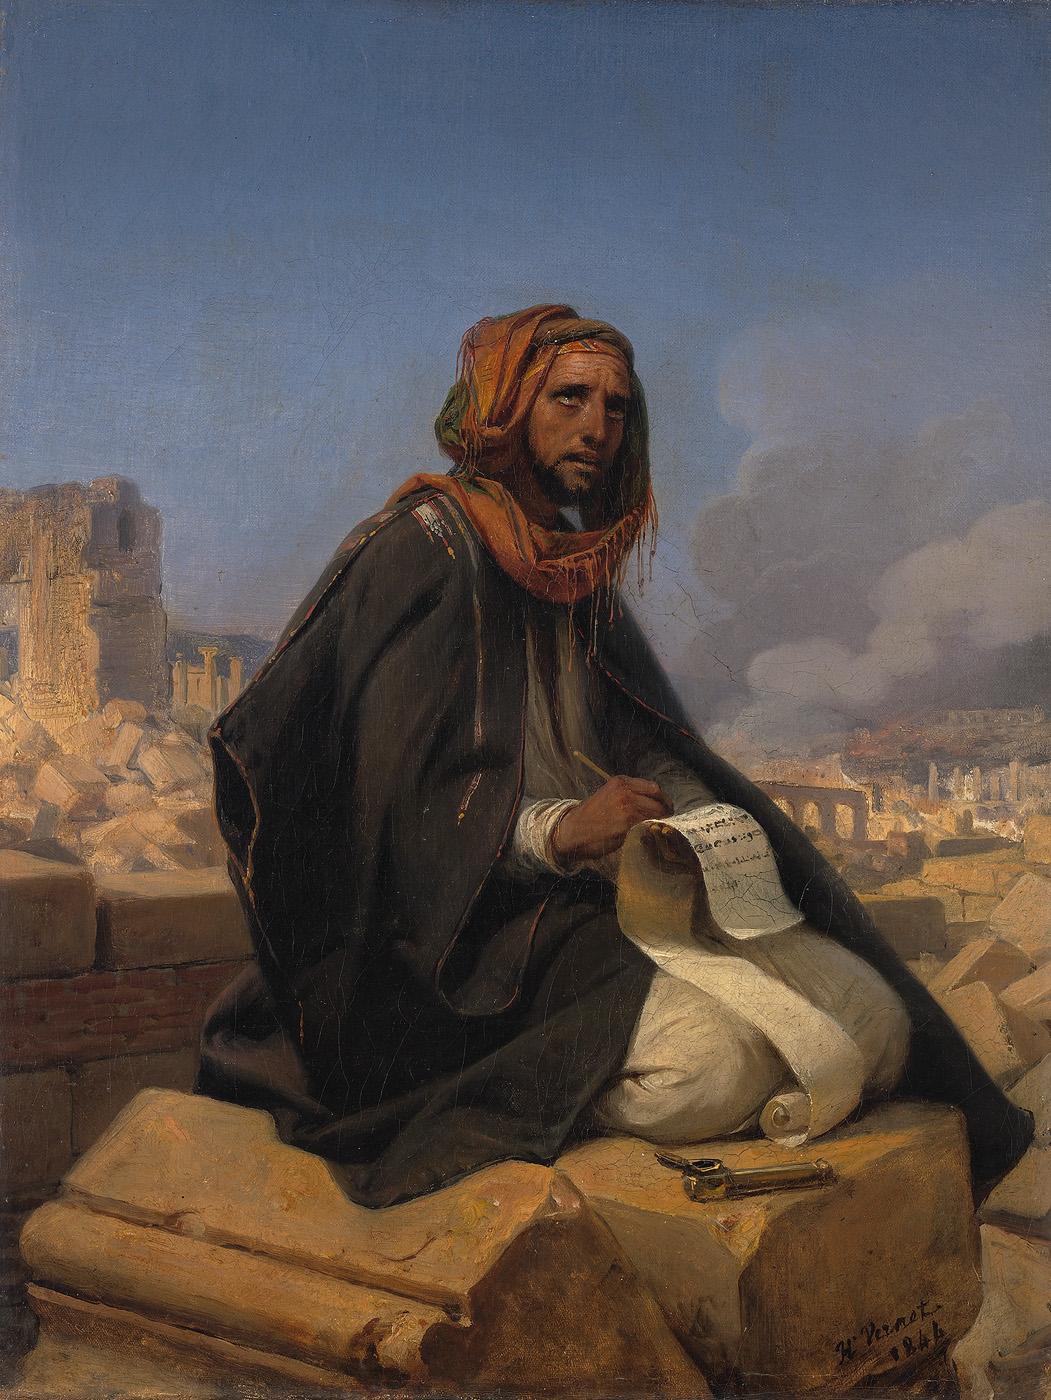 FileSA 160 Jeremia Op De Puinhopen Van Jeruzalem